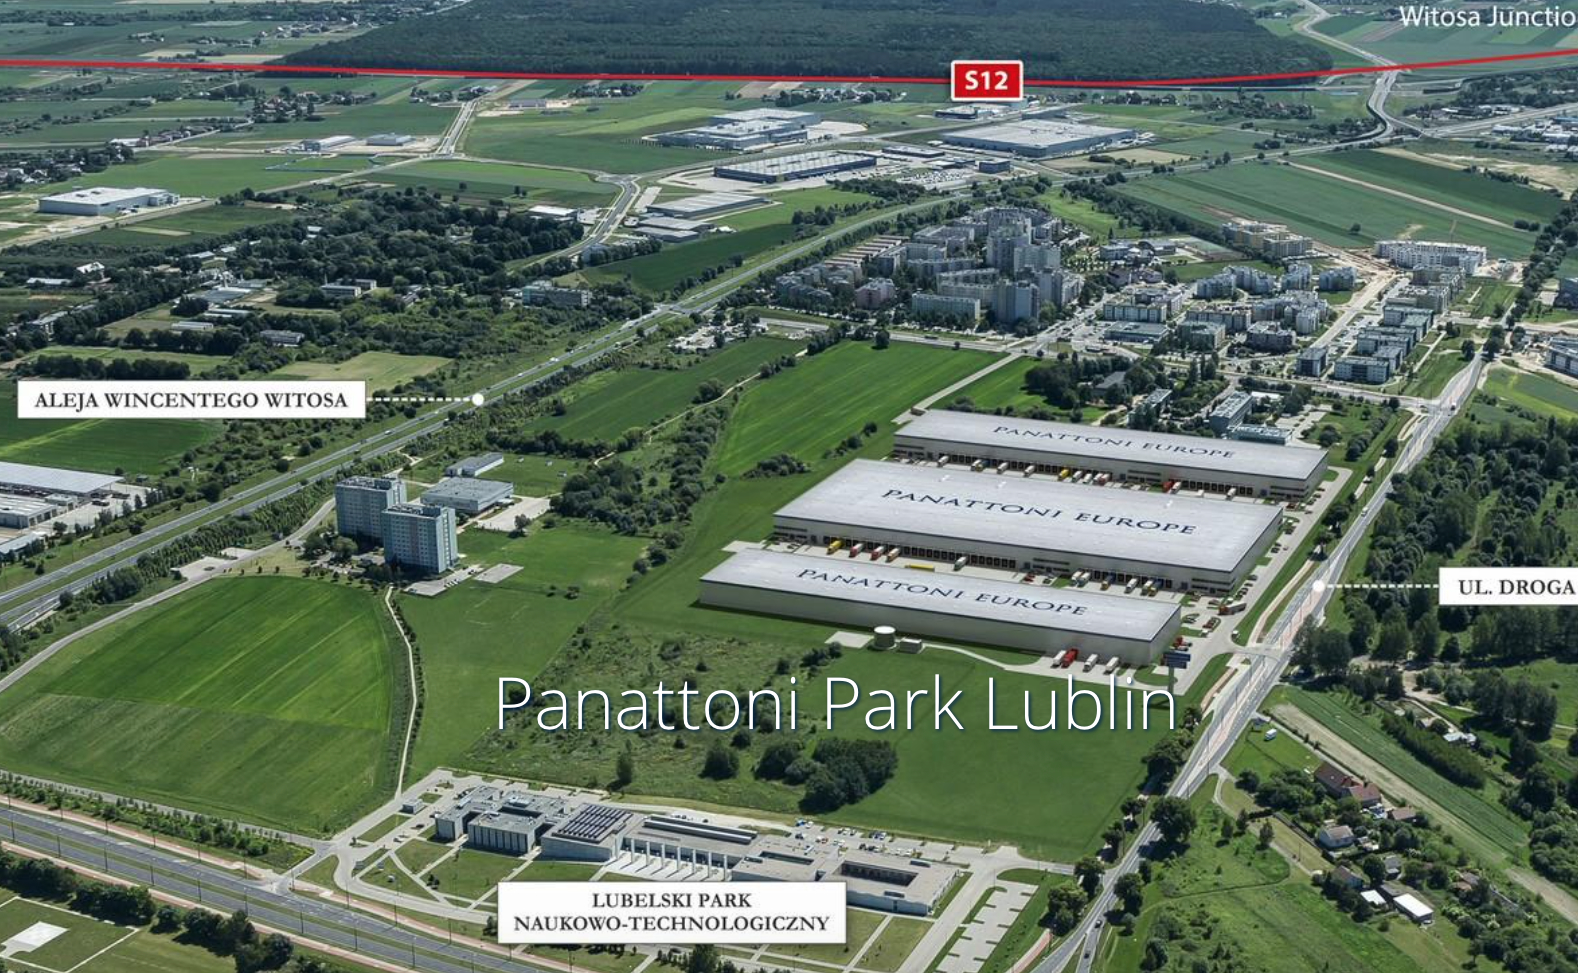 Panattoni Park Lublin